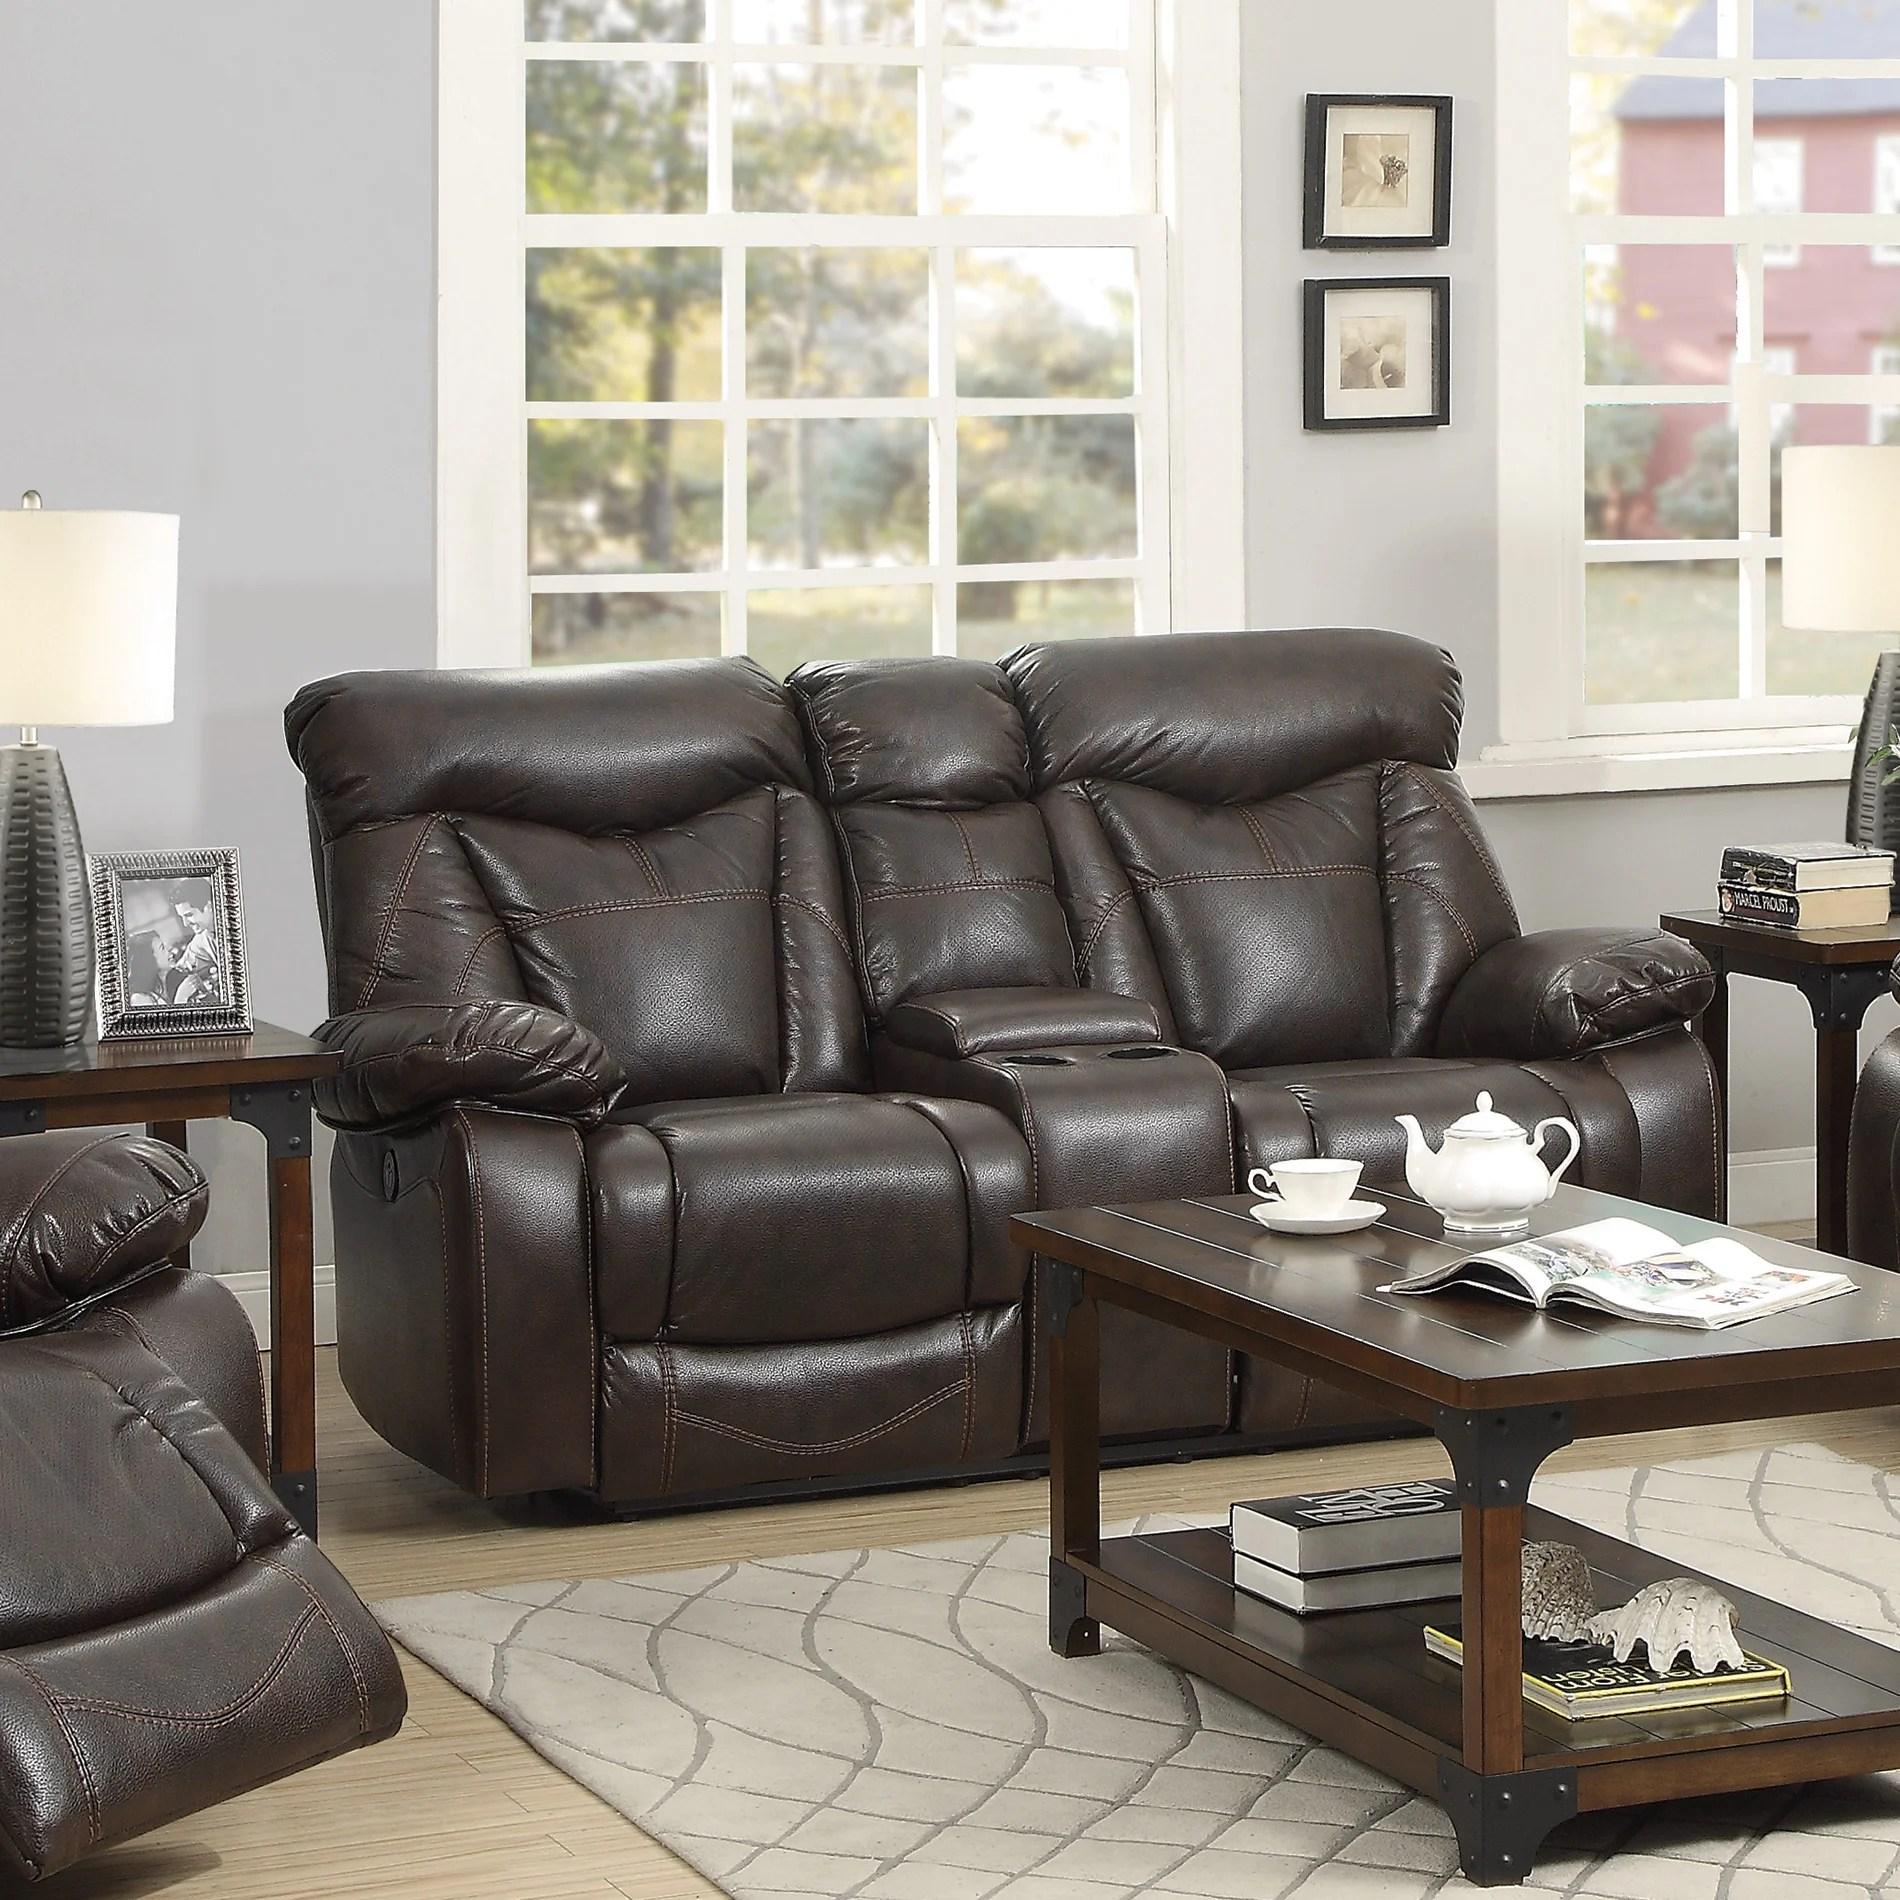 pomona sofa small traditional sofas wildon home  zimmerman power leather reclining loveseat